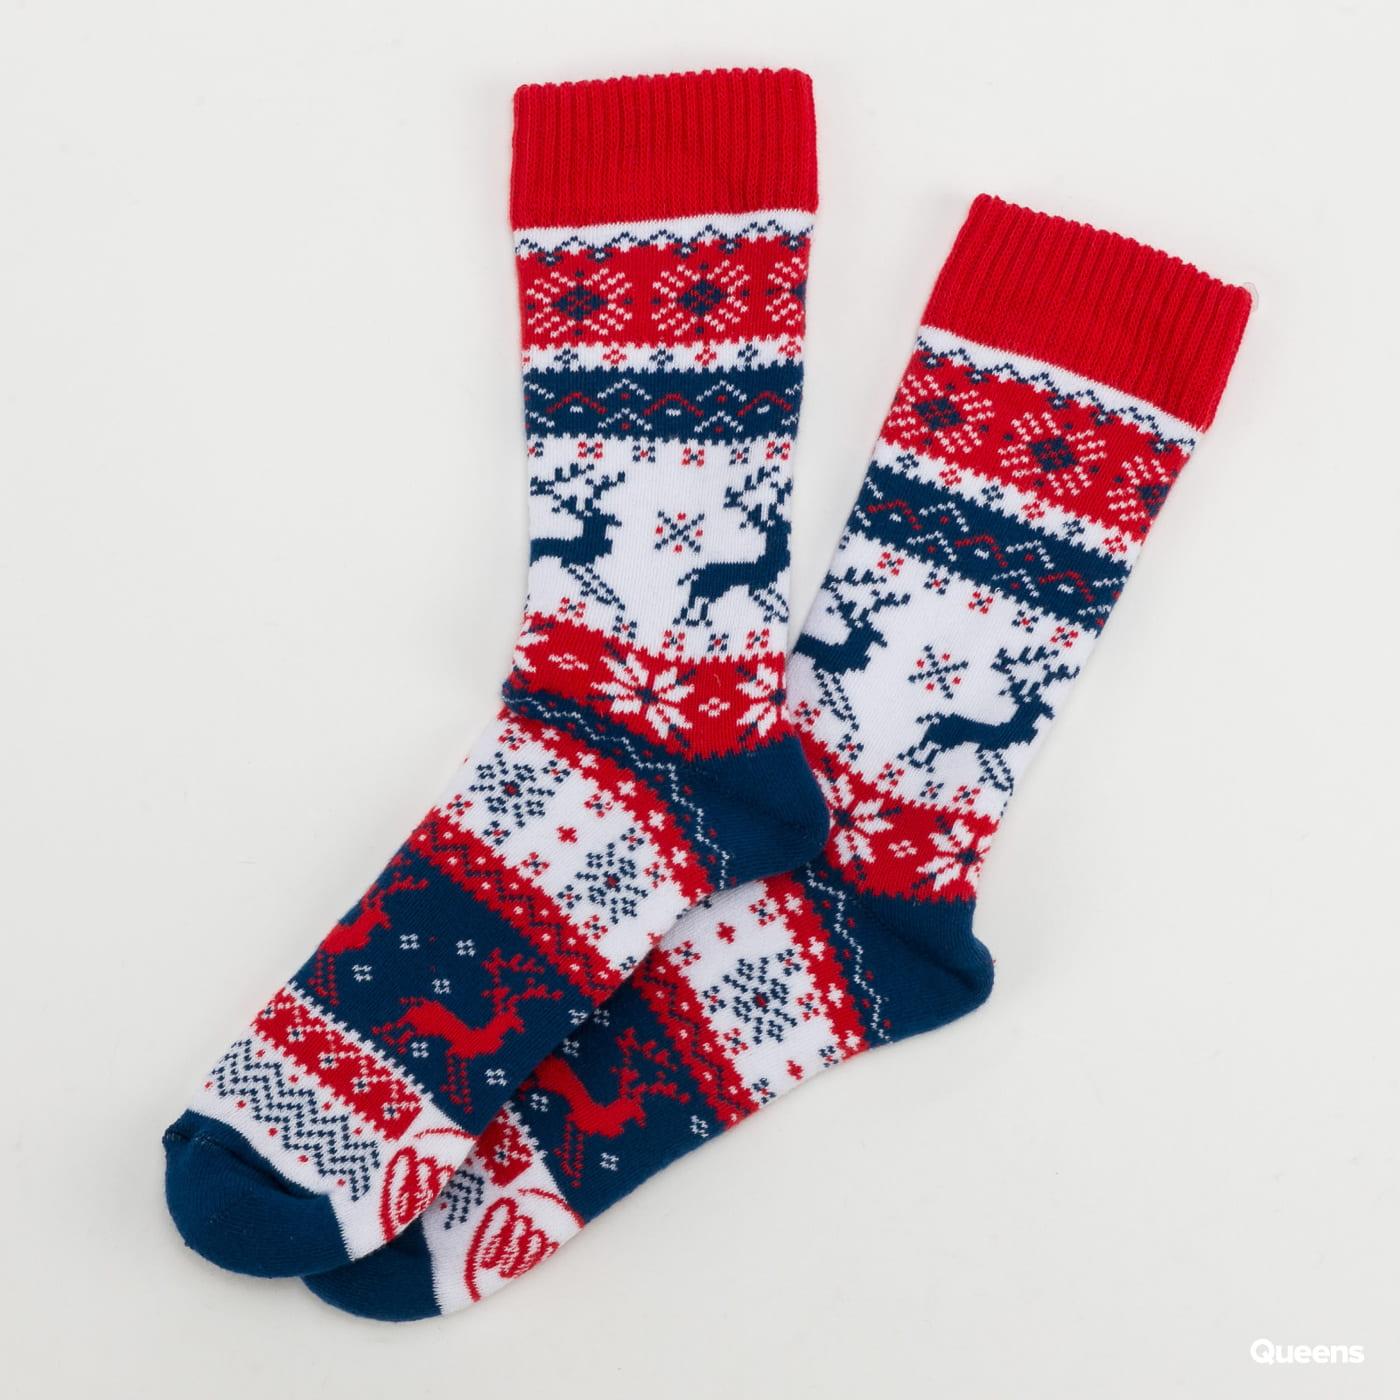 Many Mornings Warm Rudolph Socks red / dark blue / white